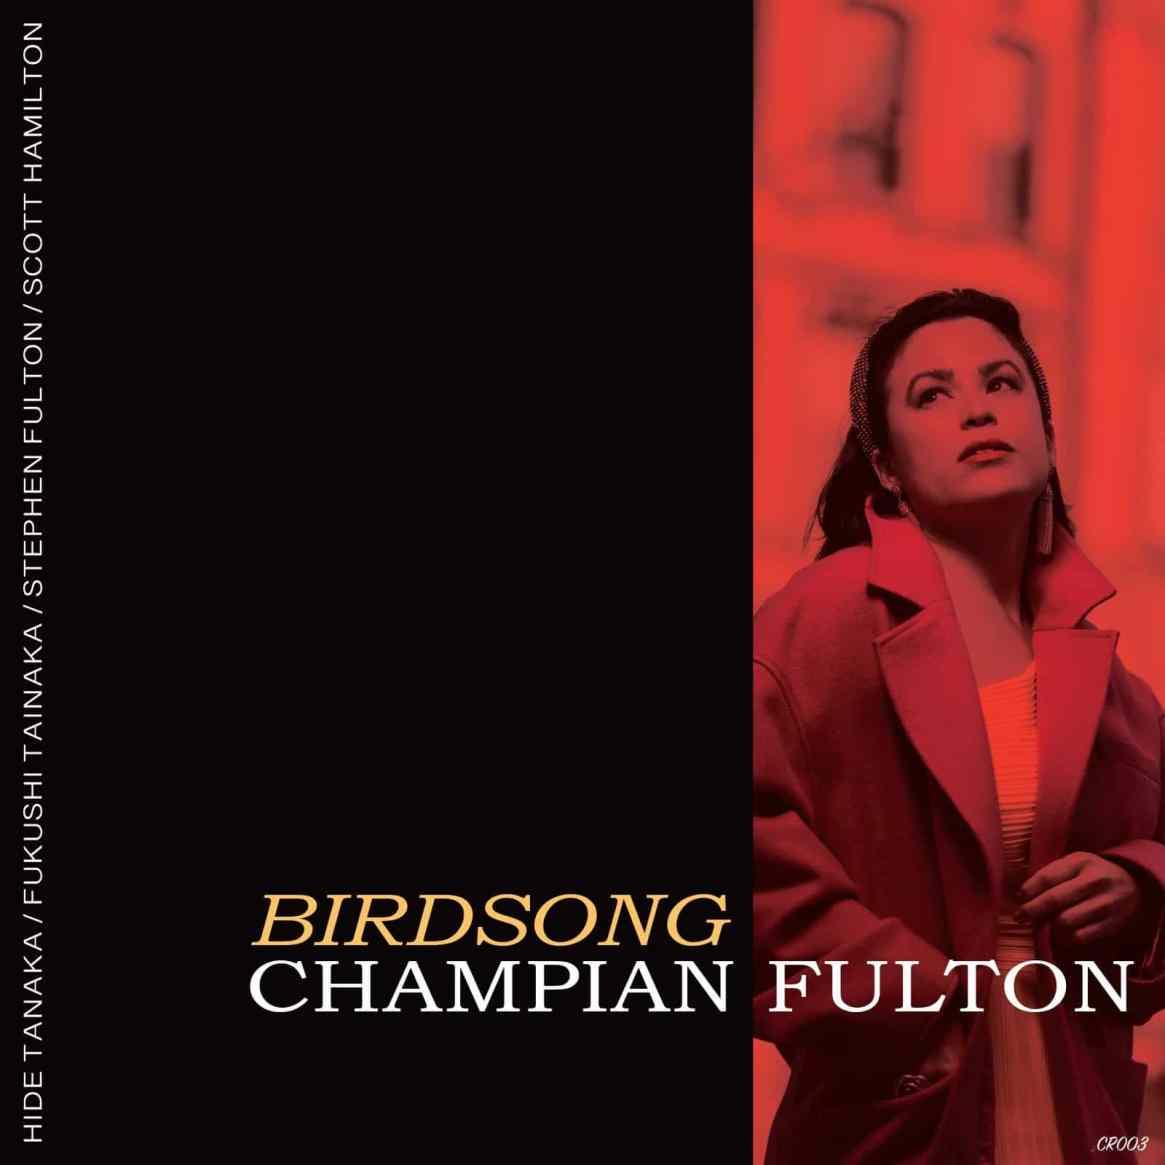 Birdsong final cover